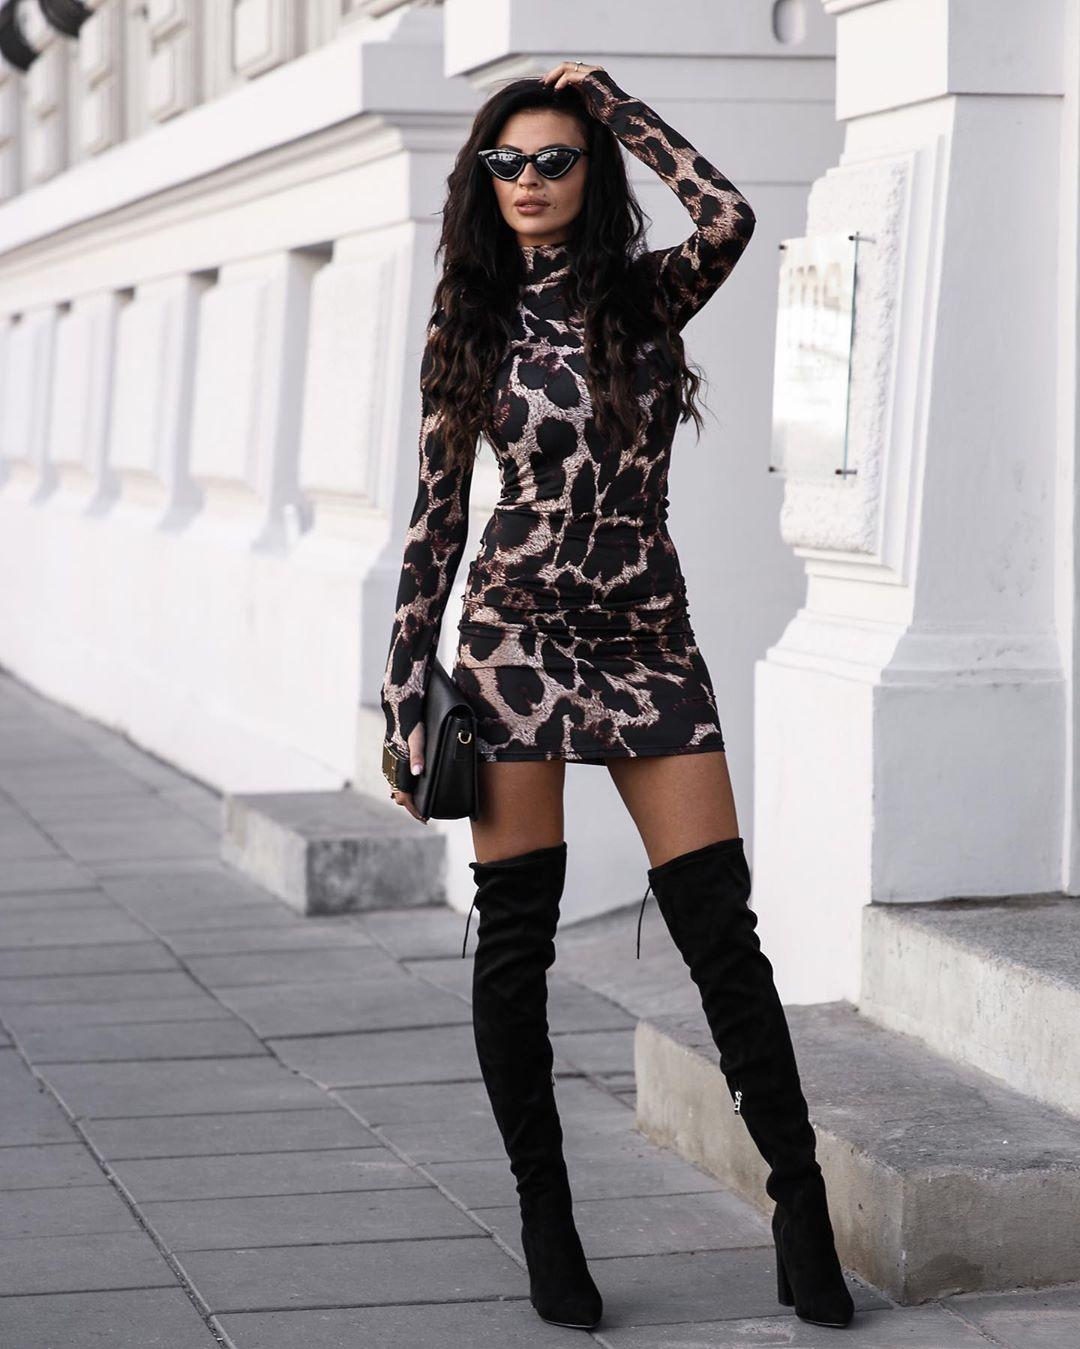 Women's Snake Skin Print Turtleneck Long Sleeve Dress 2019 Autumn Women Bodycon Mini Dress Female Club Vestidos